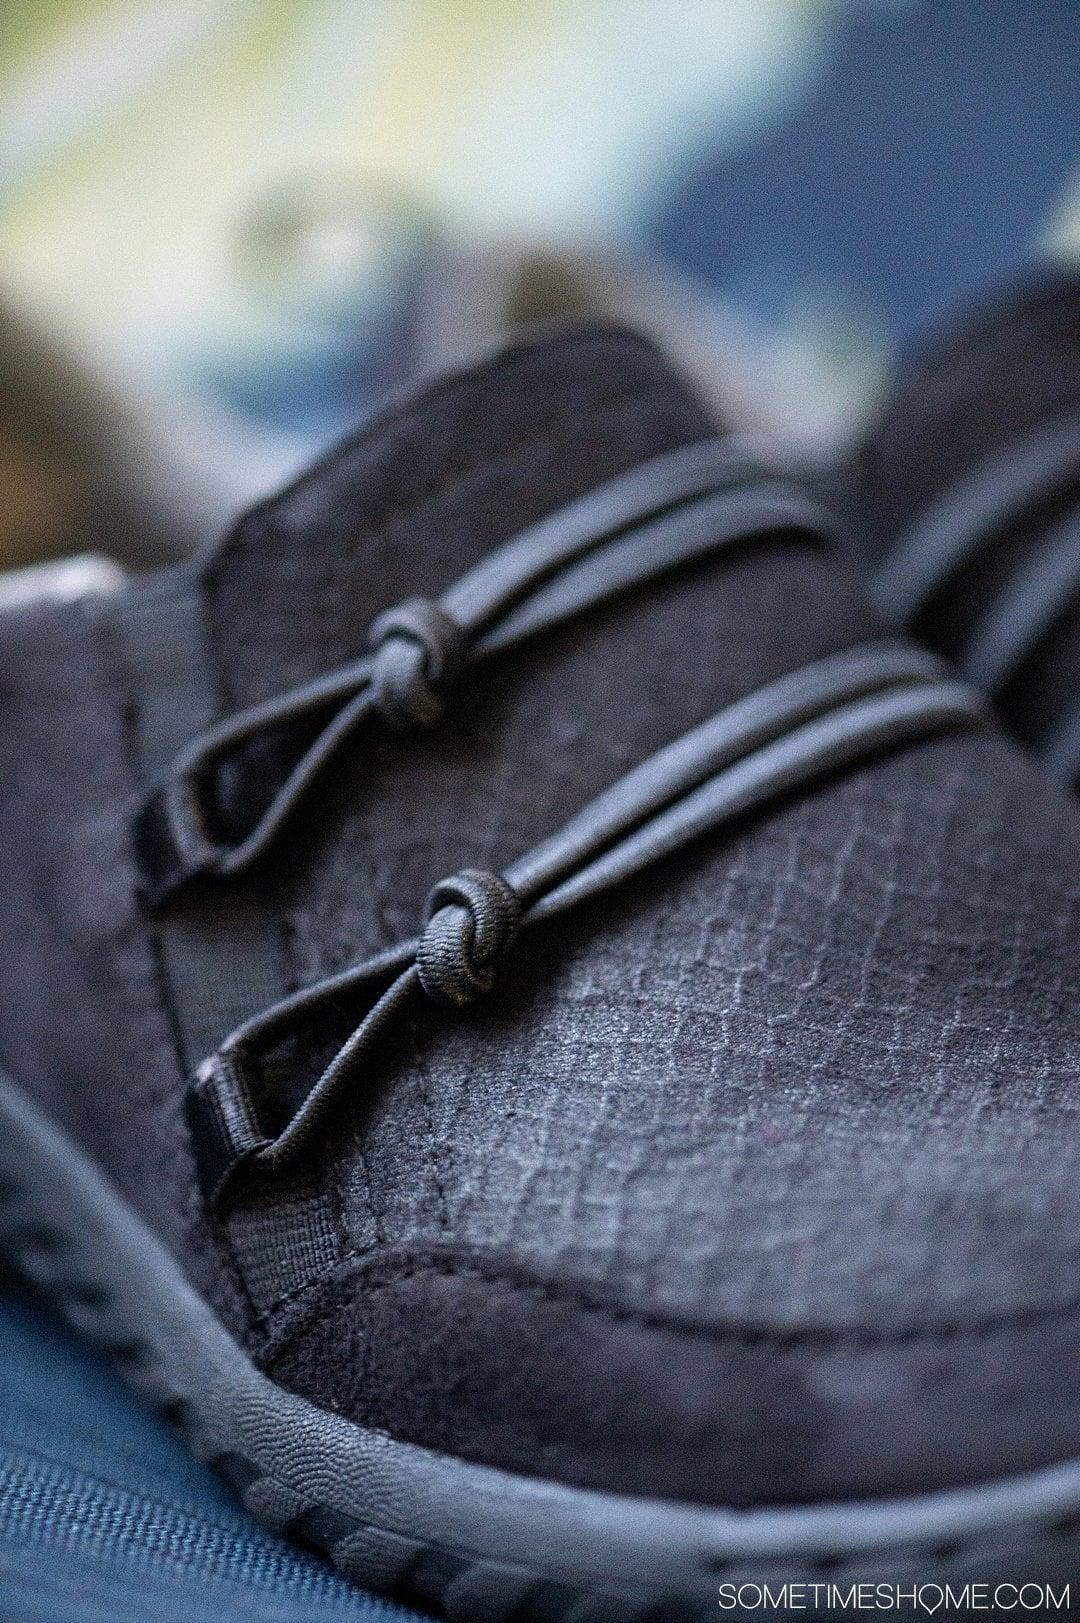 Detail of Jambu & Co. Ashton shoes, black flat women's style.